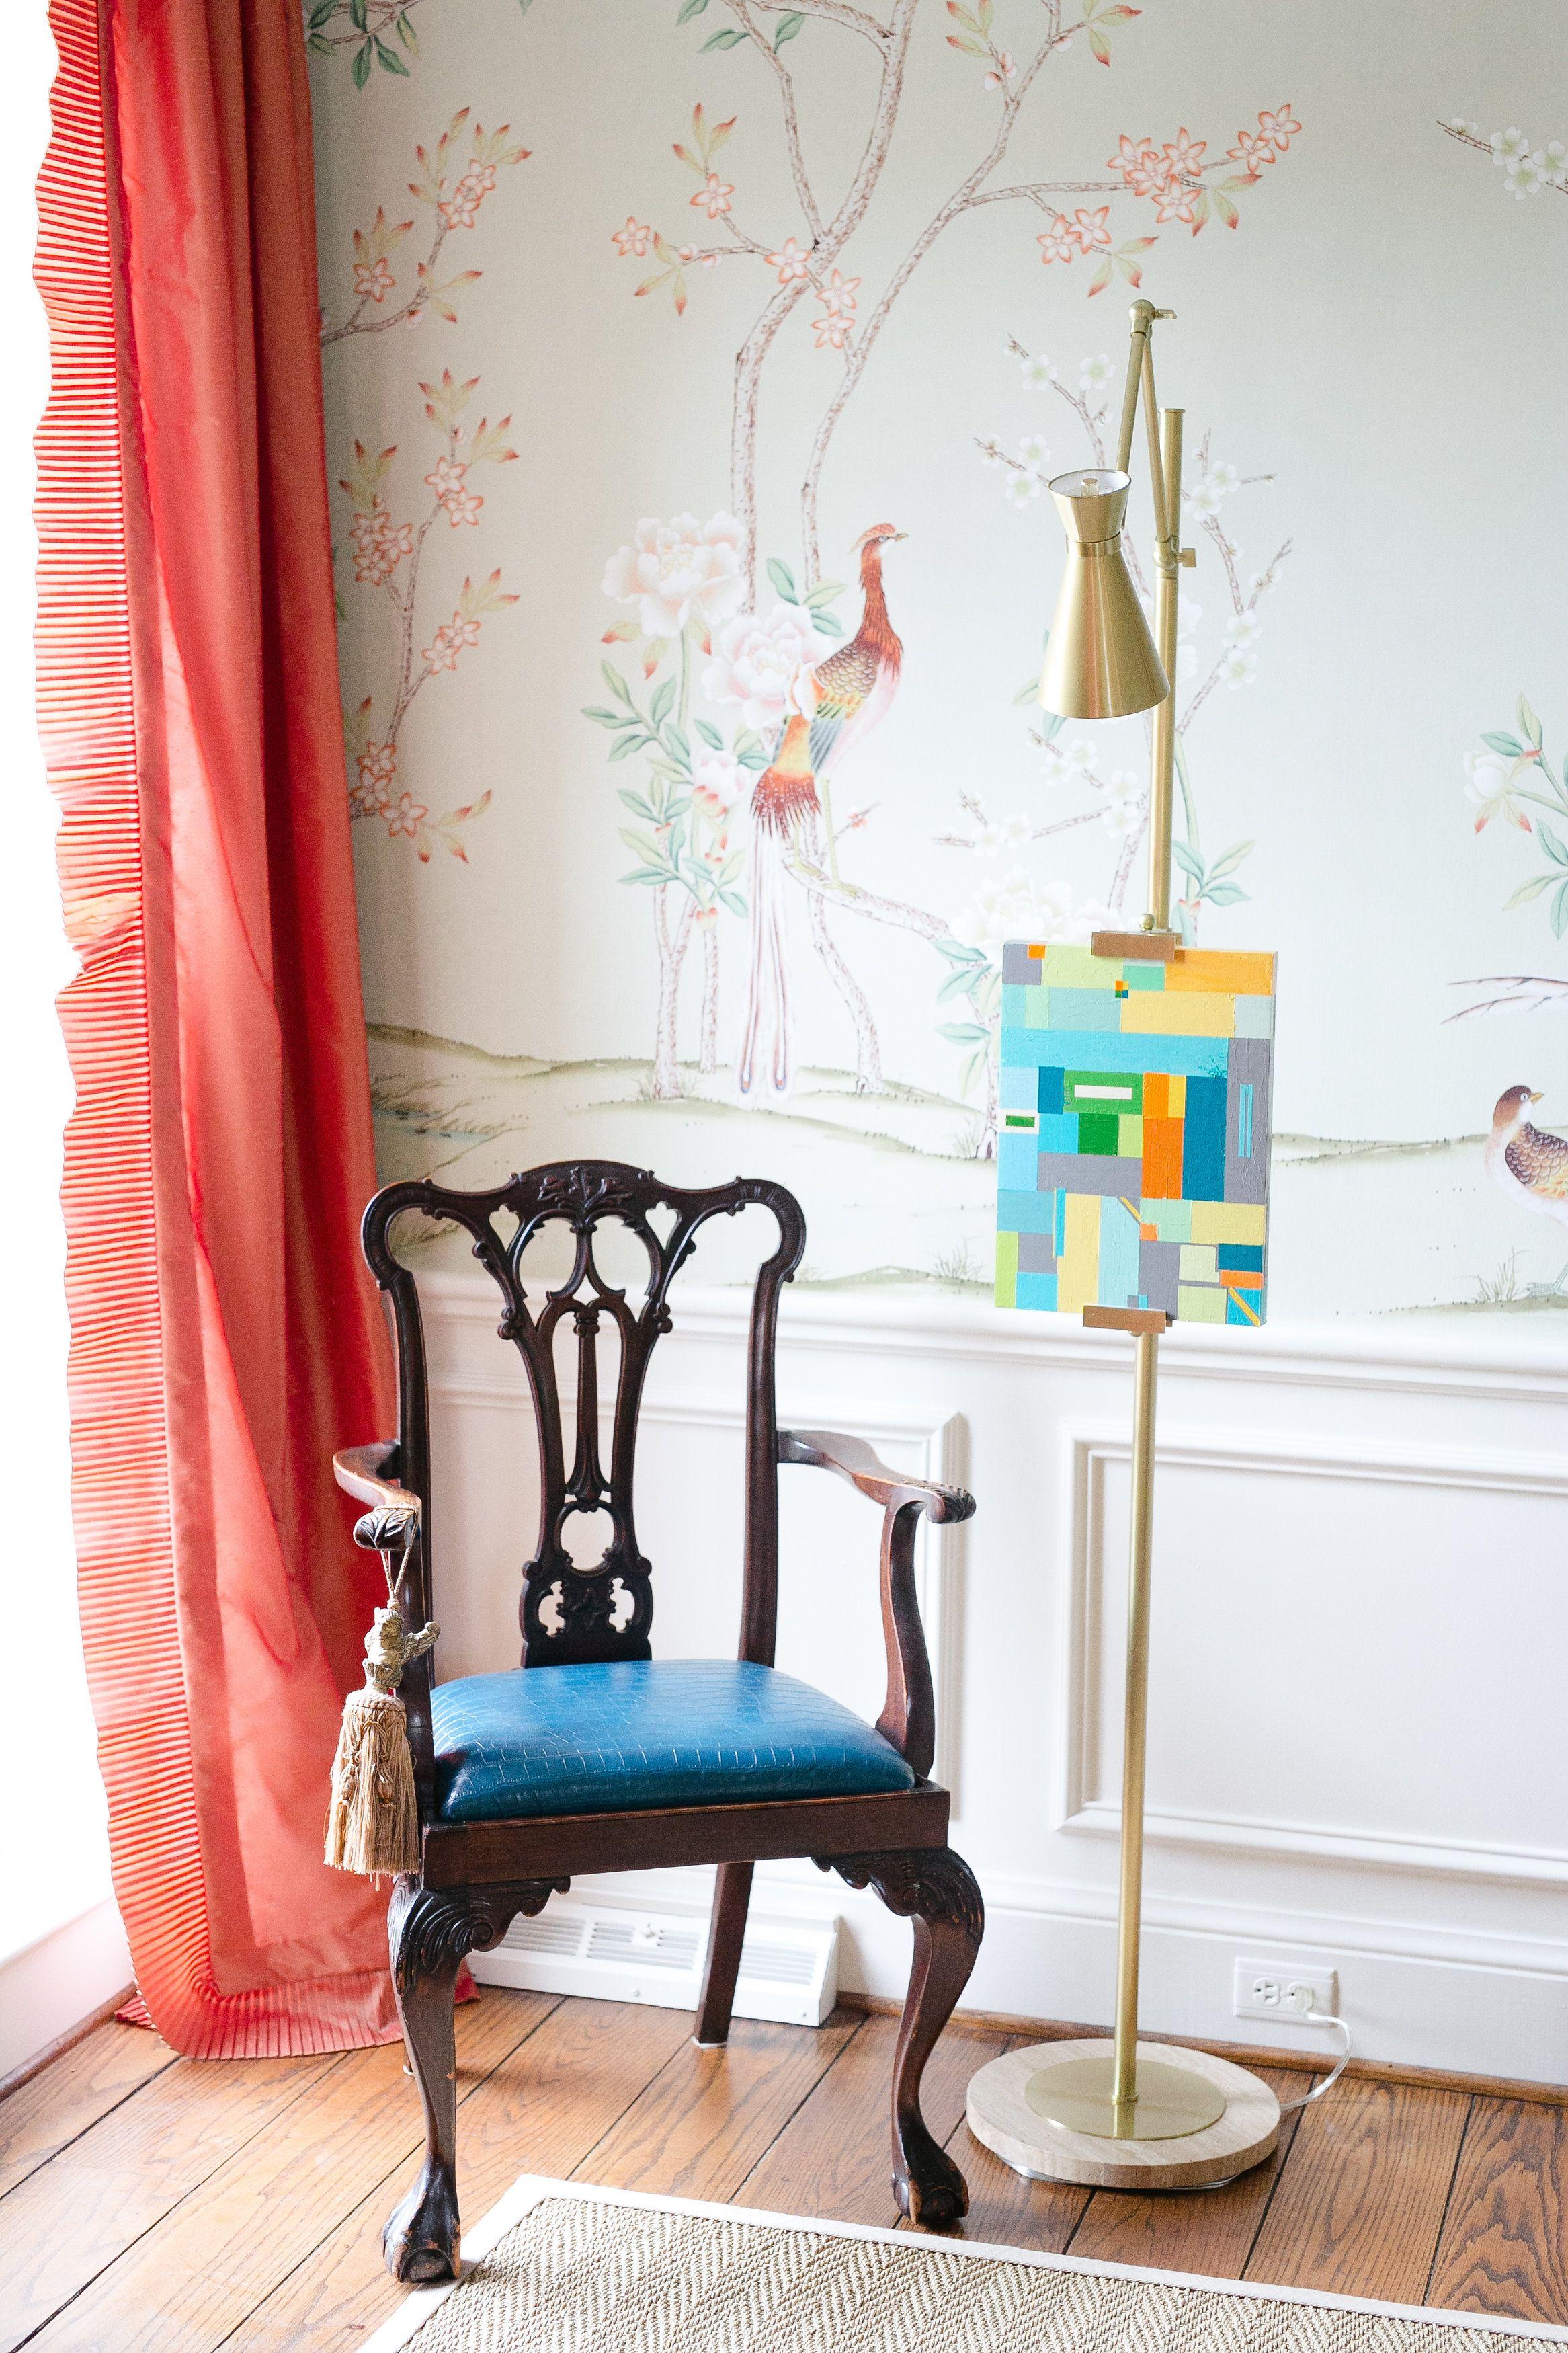 Interior Designer Crush(es): Blair Parkes and Susan Lamb